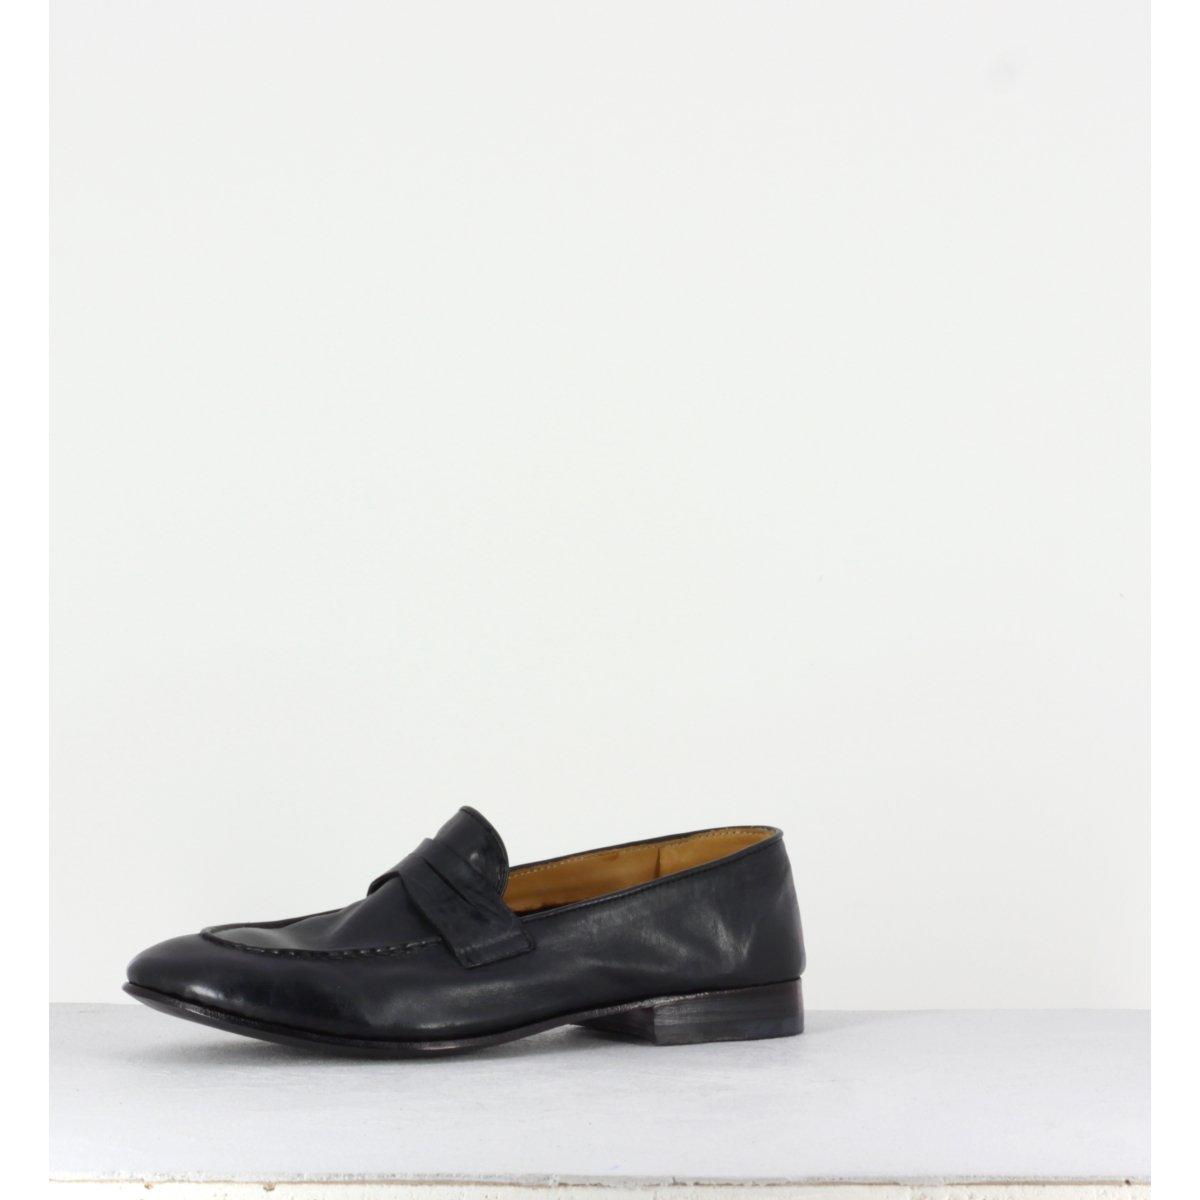 Mocassins en cuir noir VENERE48038 - Alberto Fasciani